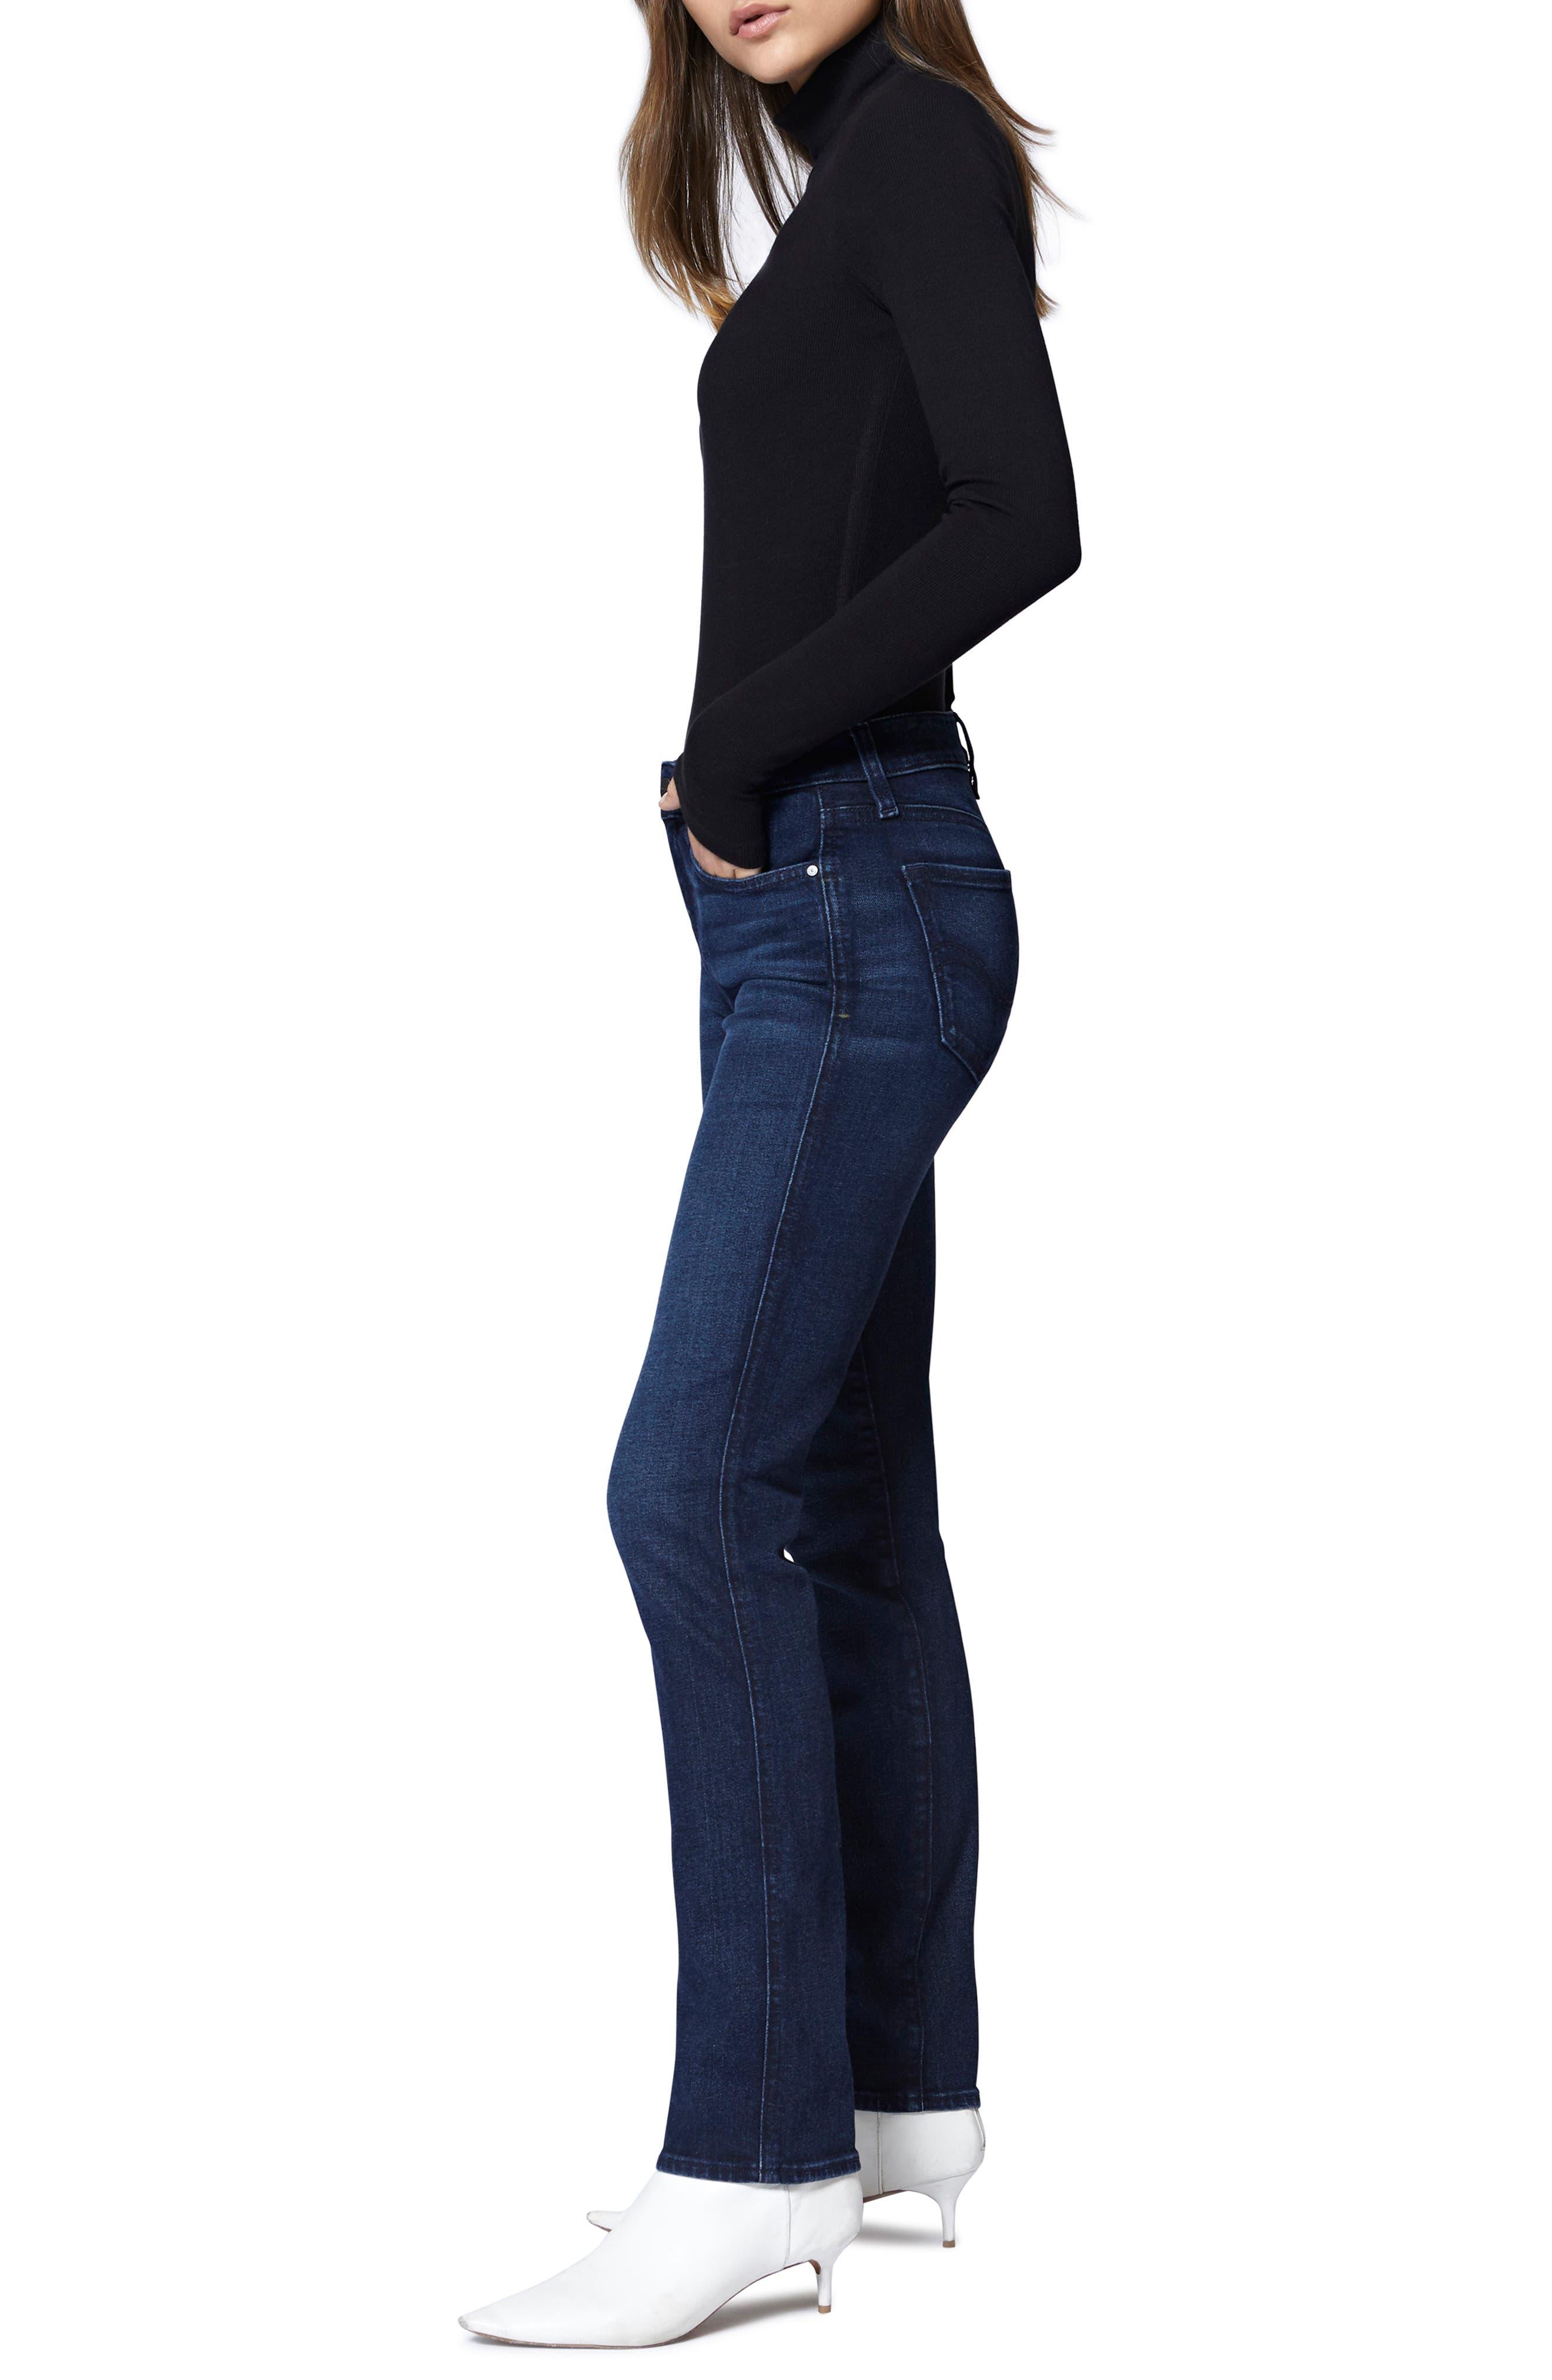 SANCTUARY,                             Social High Rise Raw Hem Skinny Ankle Jeans,                             Alternate thumbnail 8, color,                             401